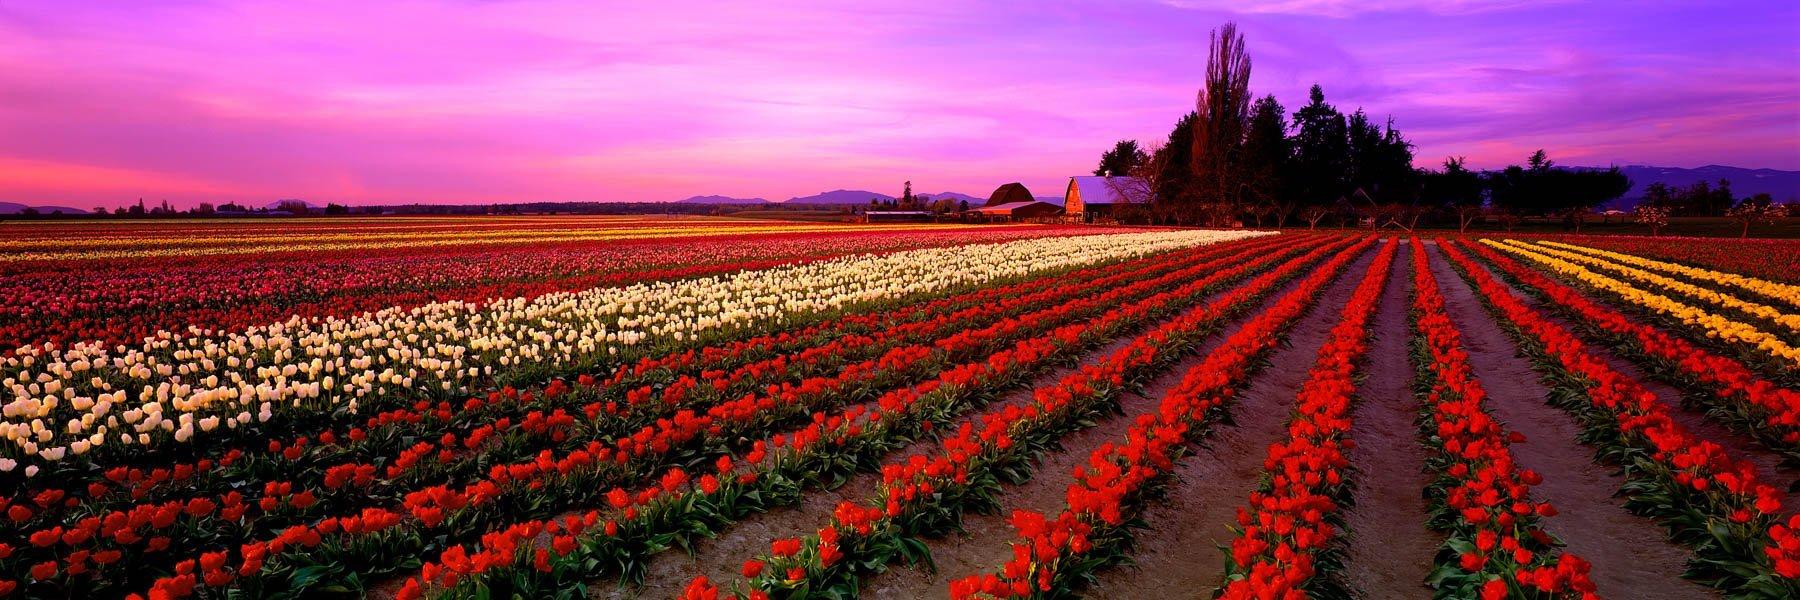 Colourful field of tulips, Skagit Valley, Washington, USA.